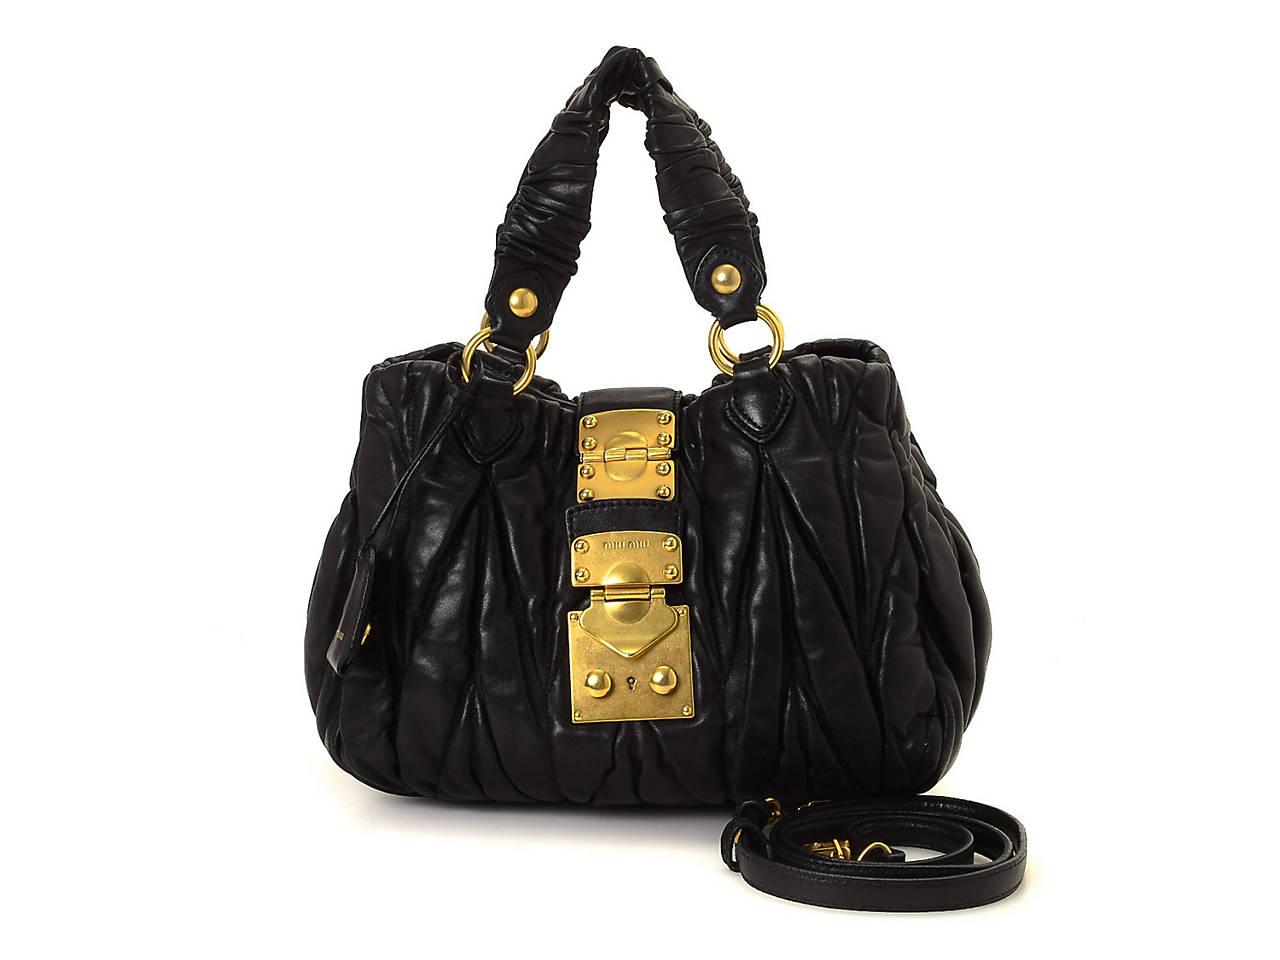 Miu Miu - Vintage Luxury Matelasse Two Way Leather Shoulder Bag ... 19fe3cfc1e8f3